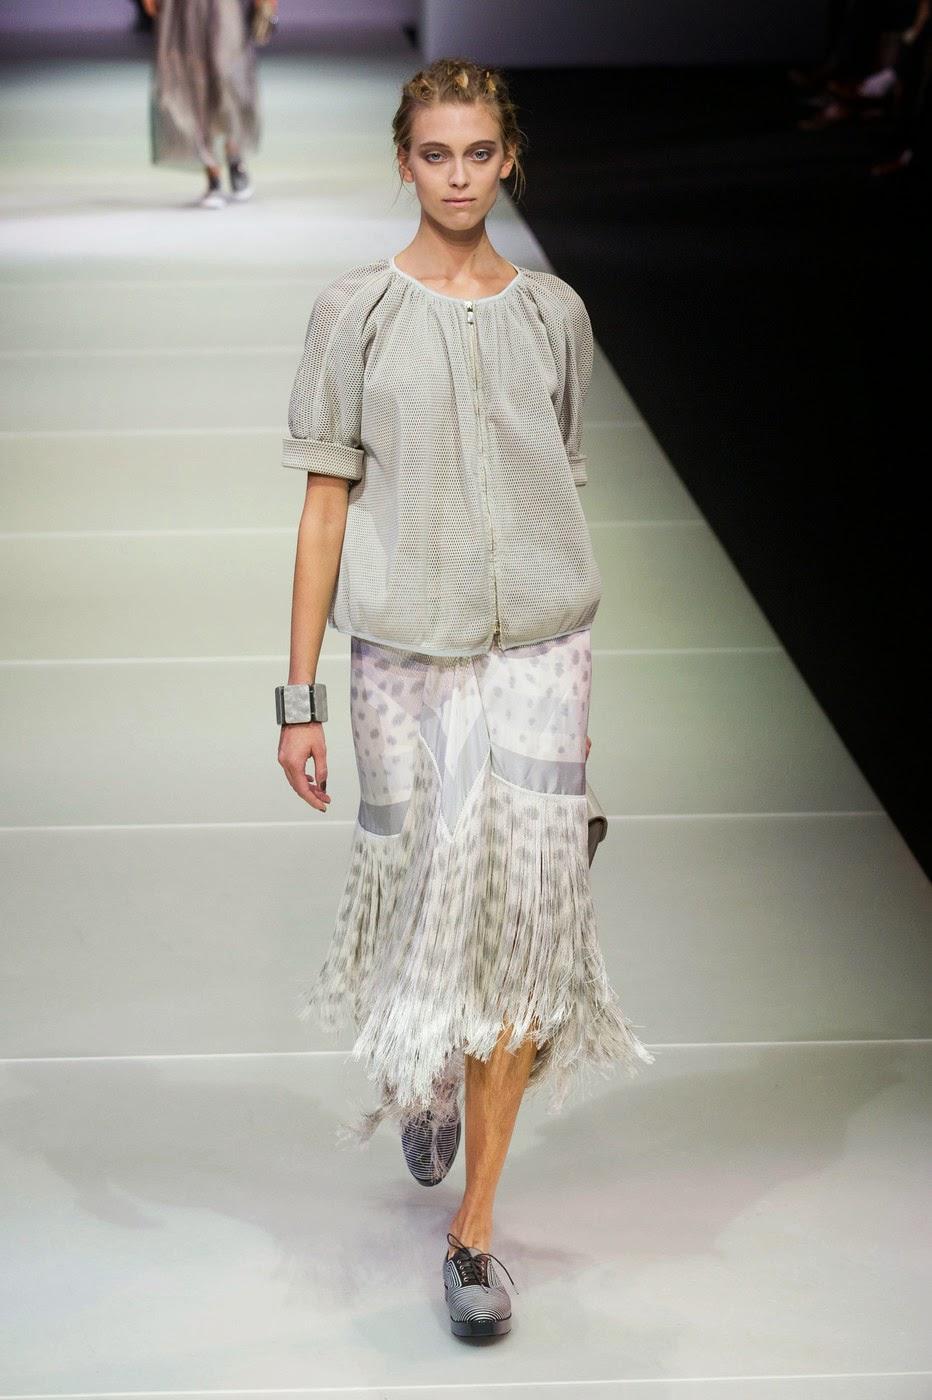 Юбка с бахромой от Giorgio Armani 2015